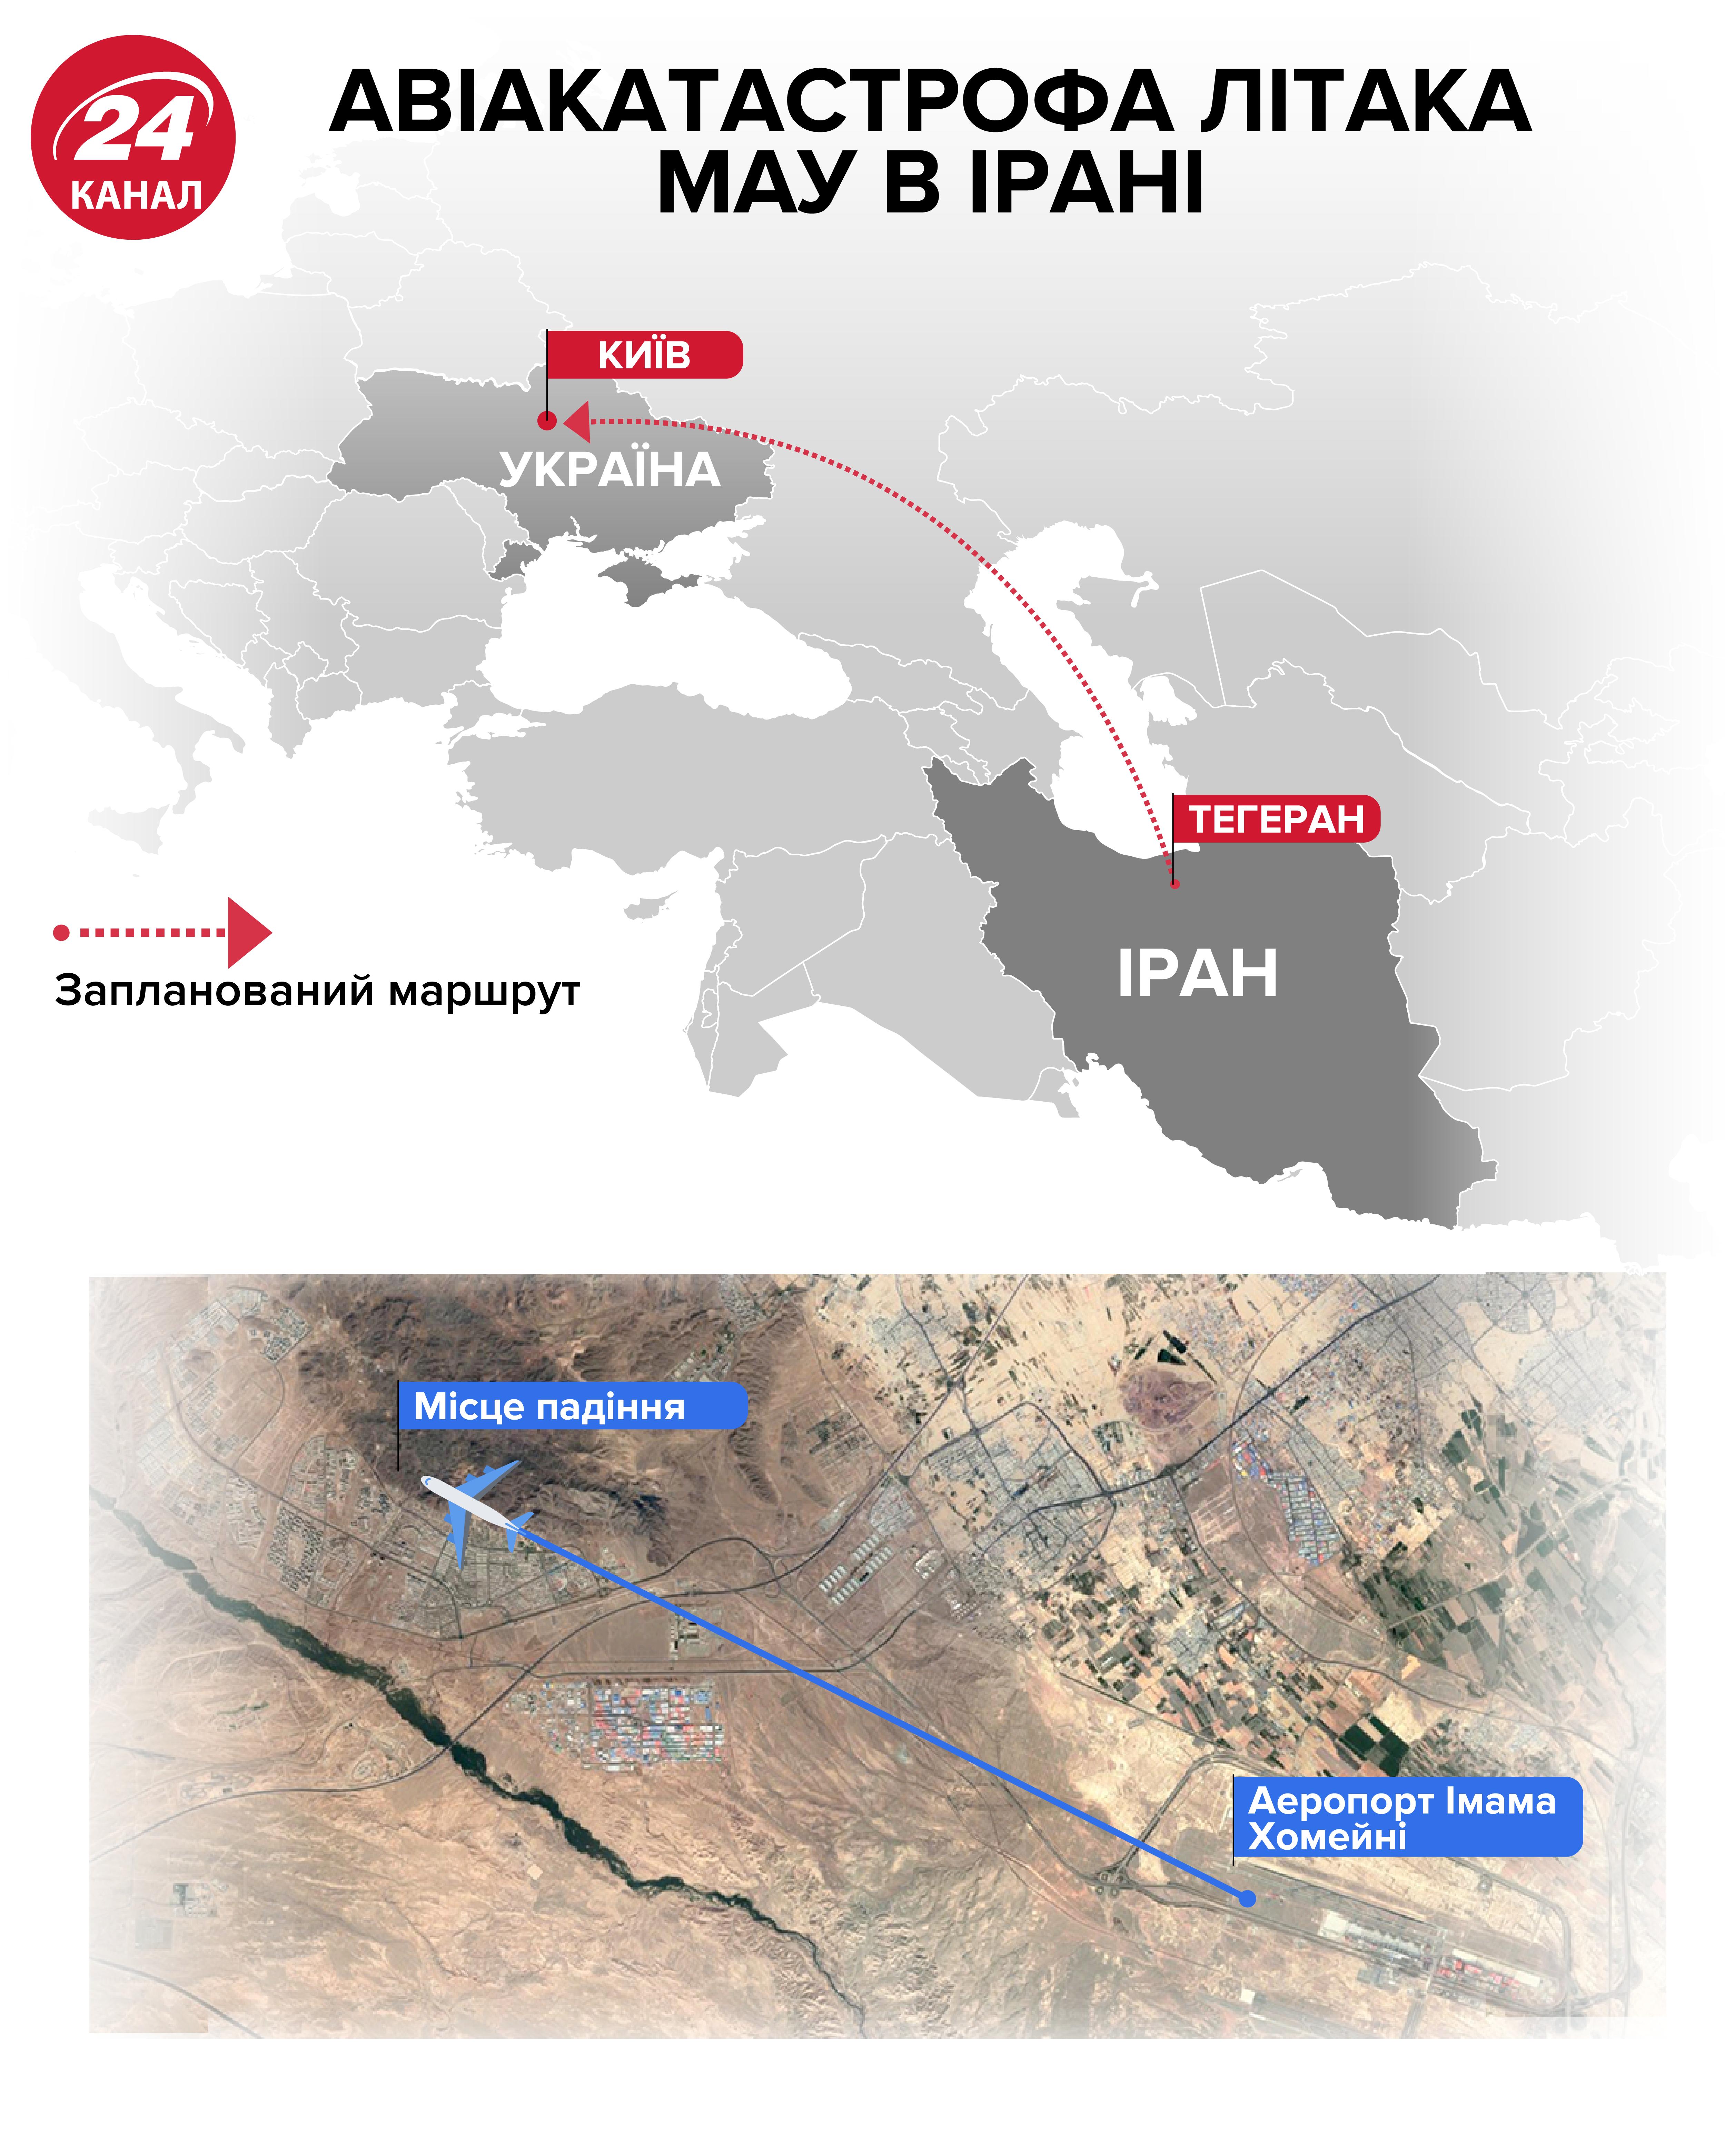 місце катастрофи літака МАУ Іран мапа падіння літака